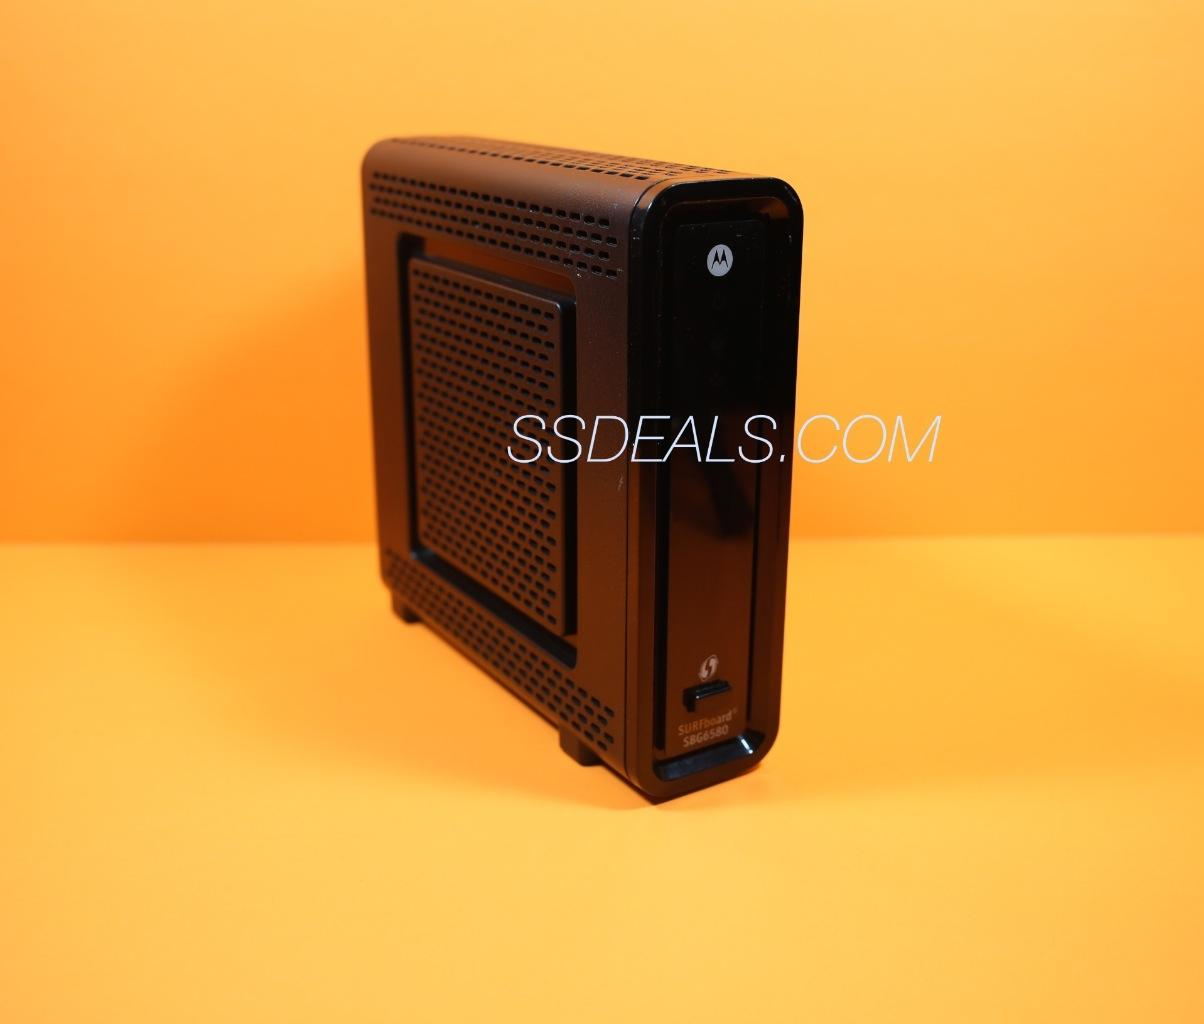 Motorola surfboard sb6141 deals - Best deals hotels boston